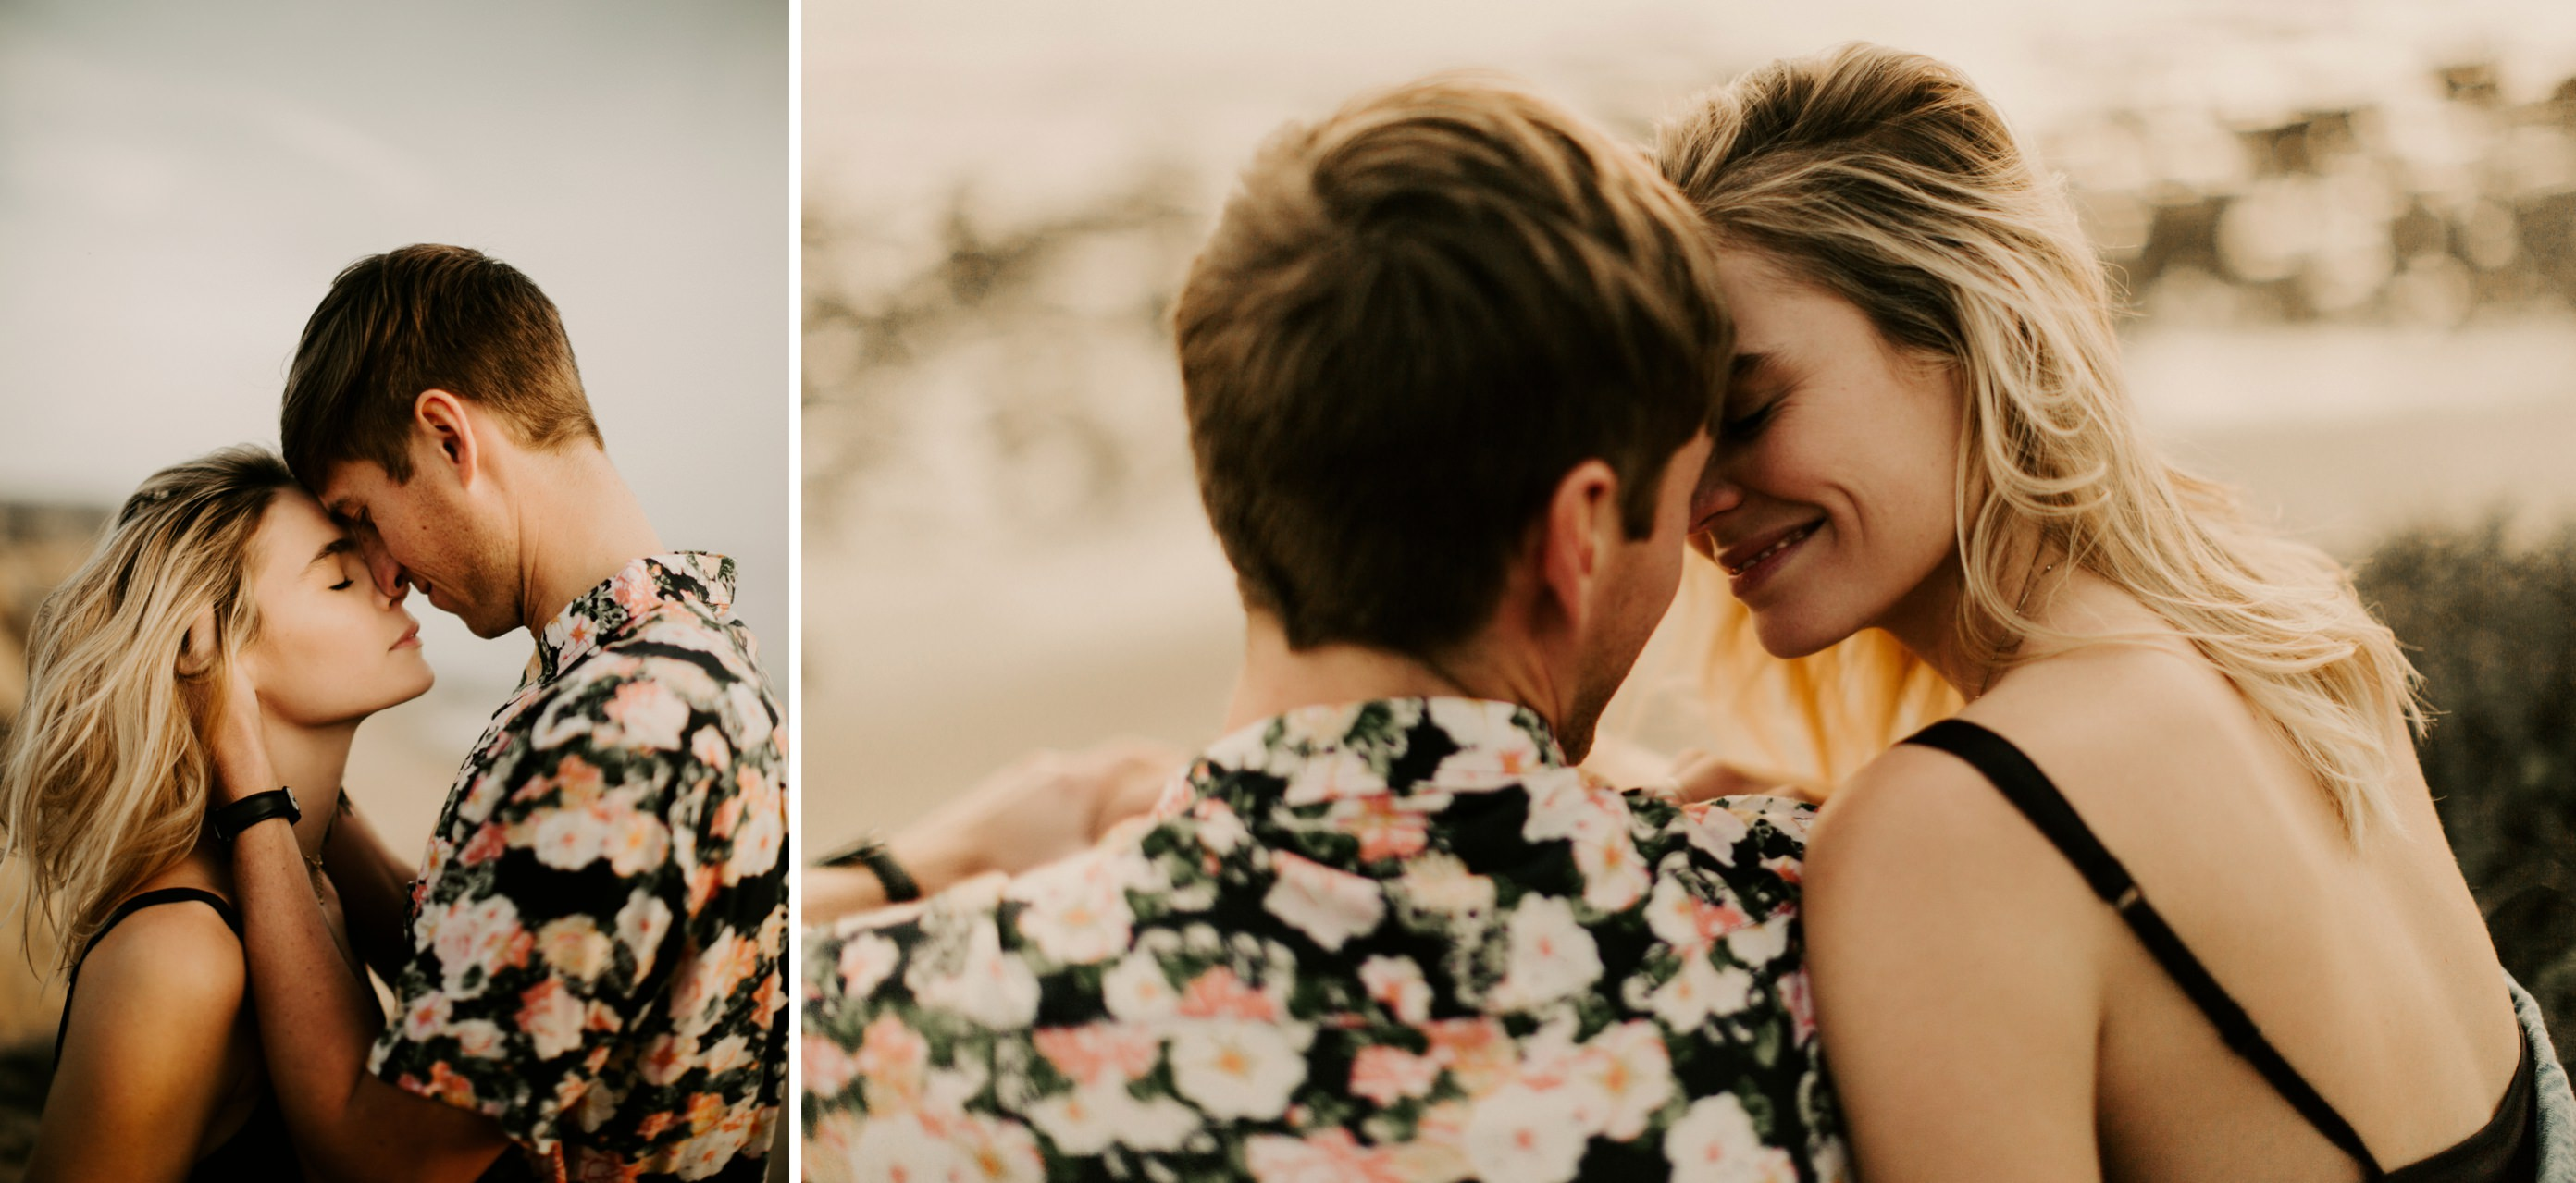 mens floral shirt engagement photos Southern California Engagement Shoot